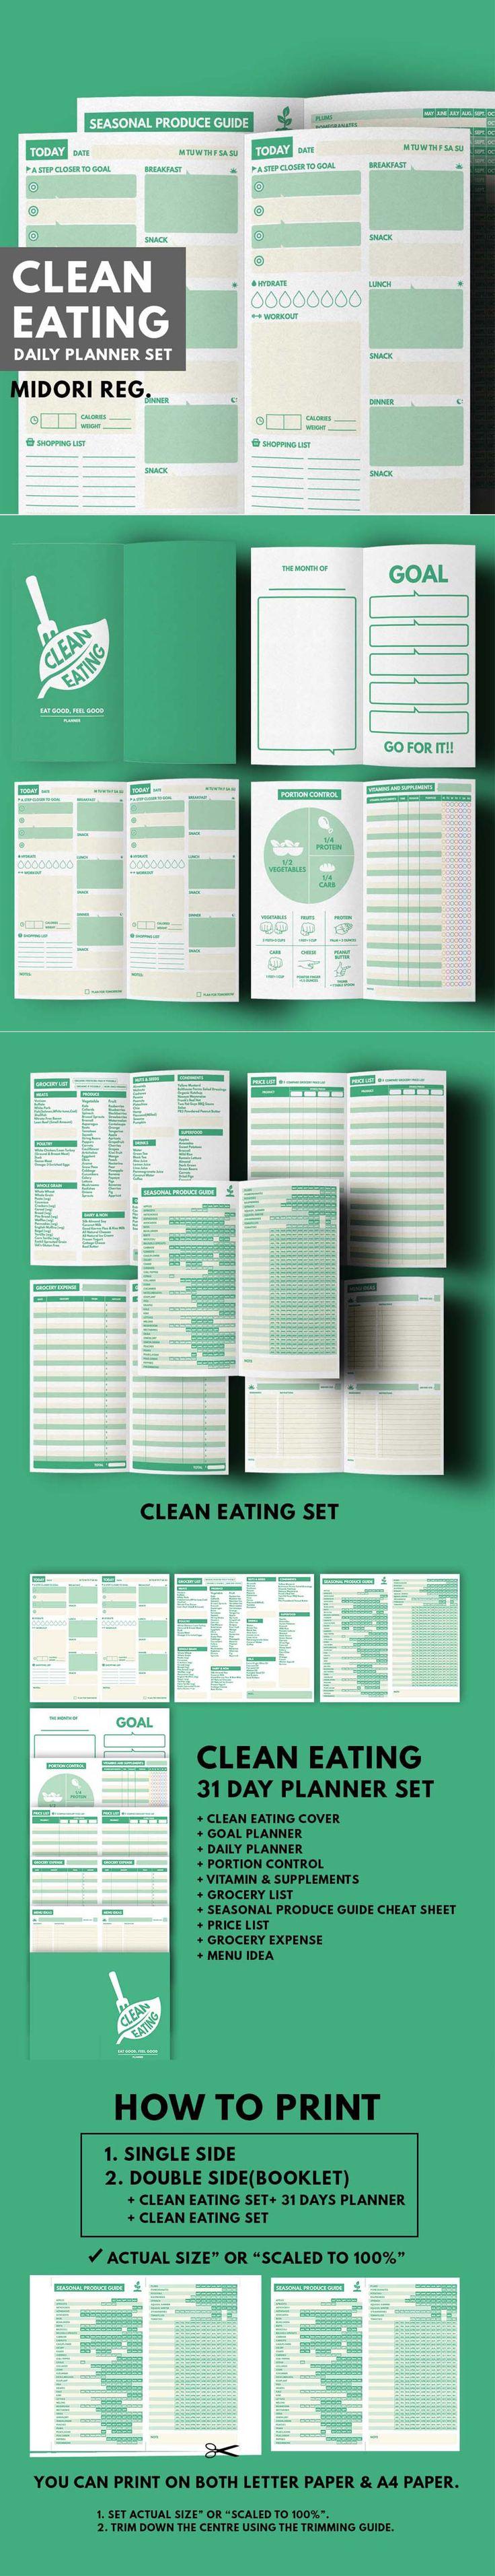 279 best planner images on Pinterest   Bullet journal, Personal ...